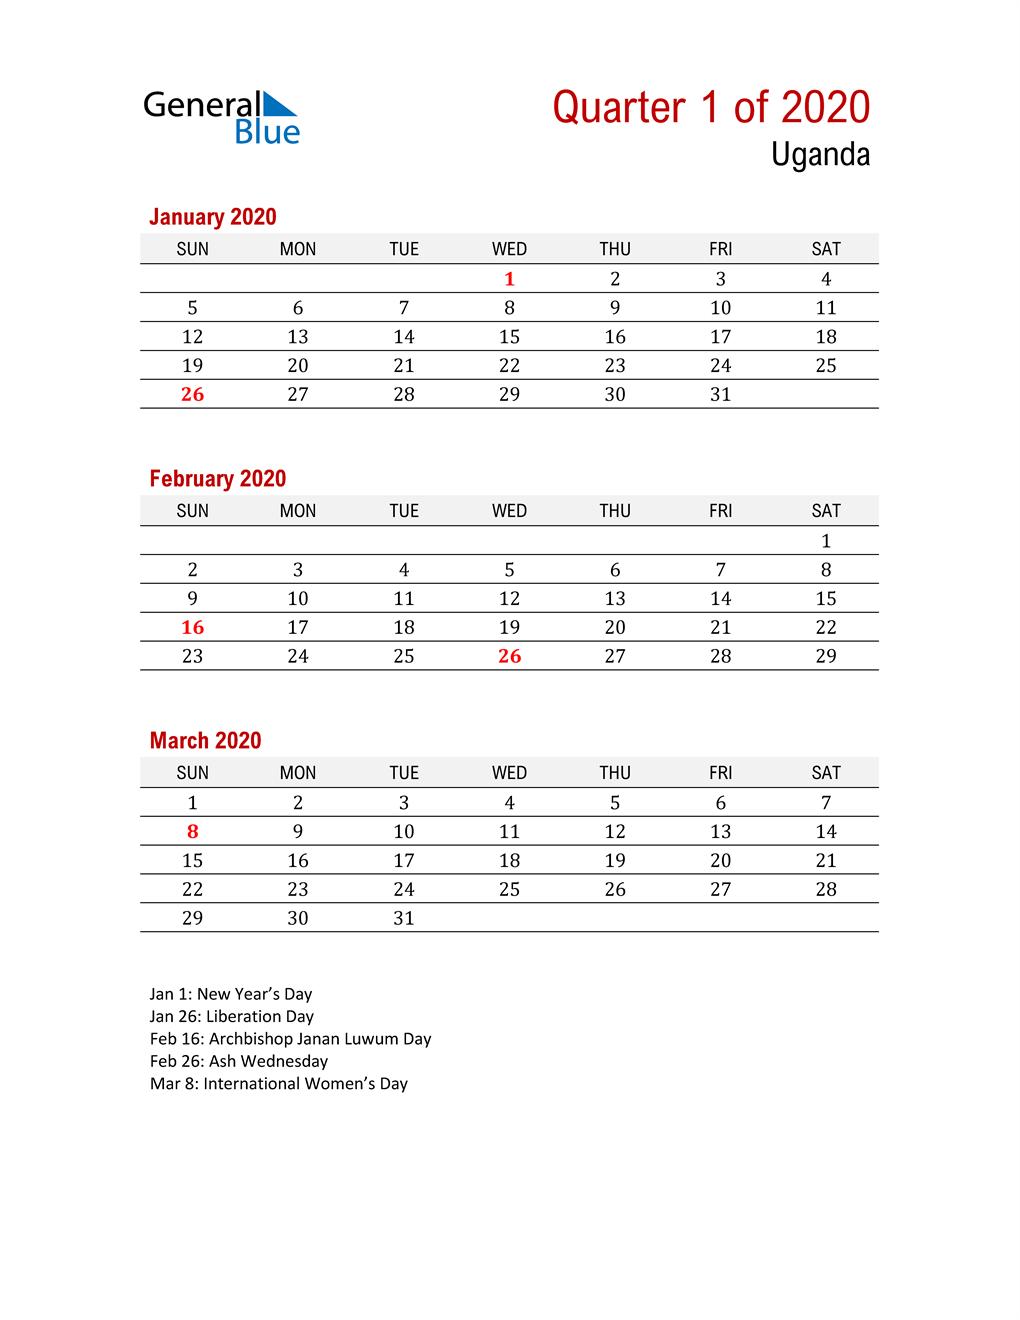 Printable Three Month Calendar for Uganda